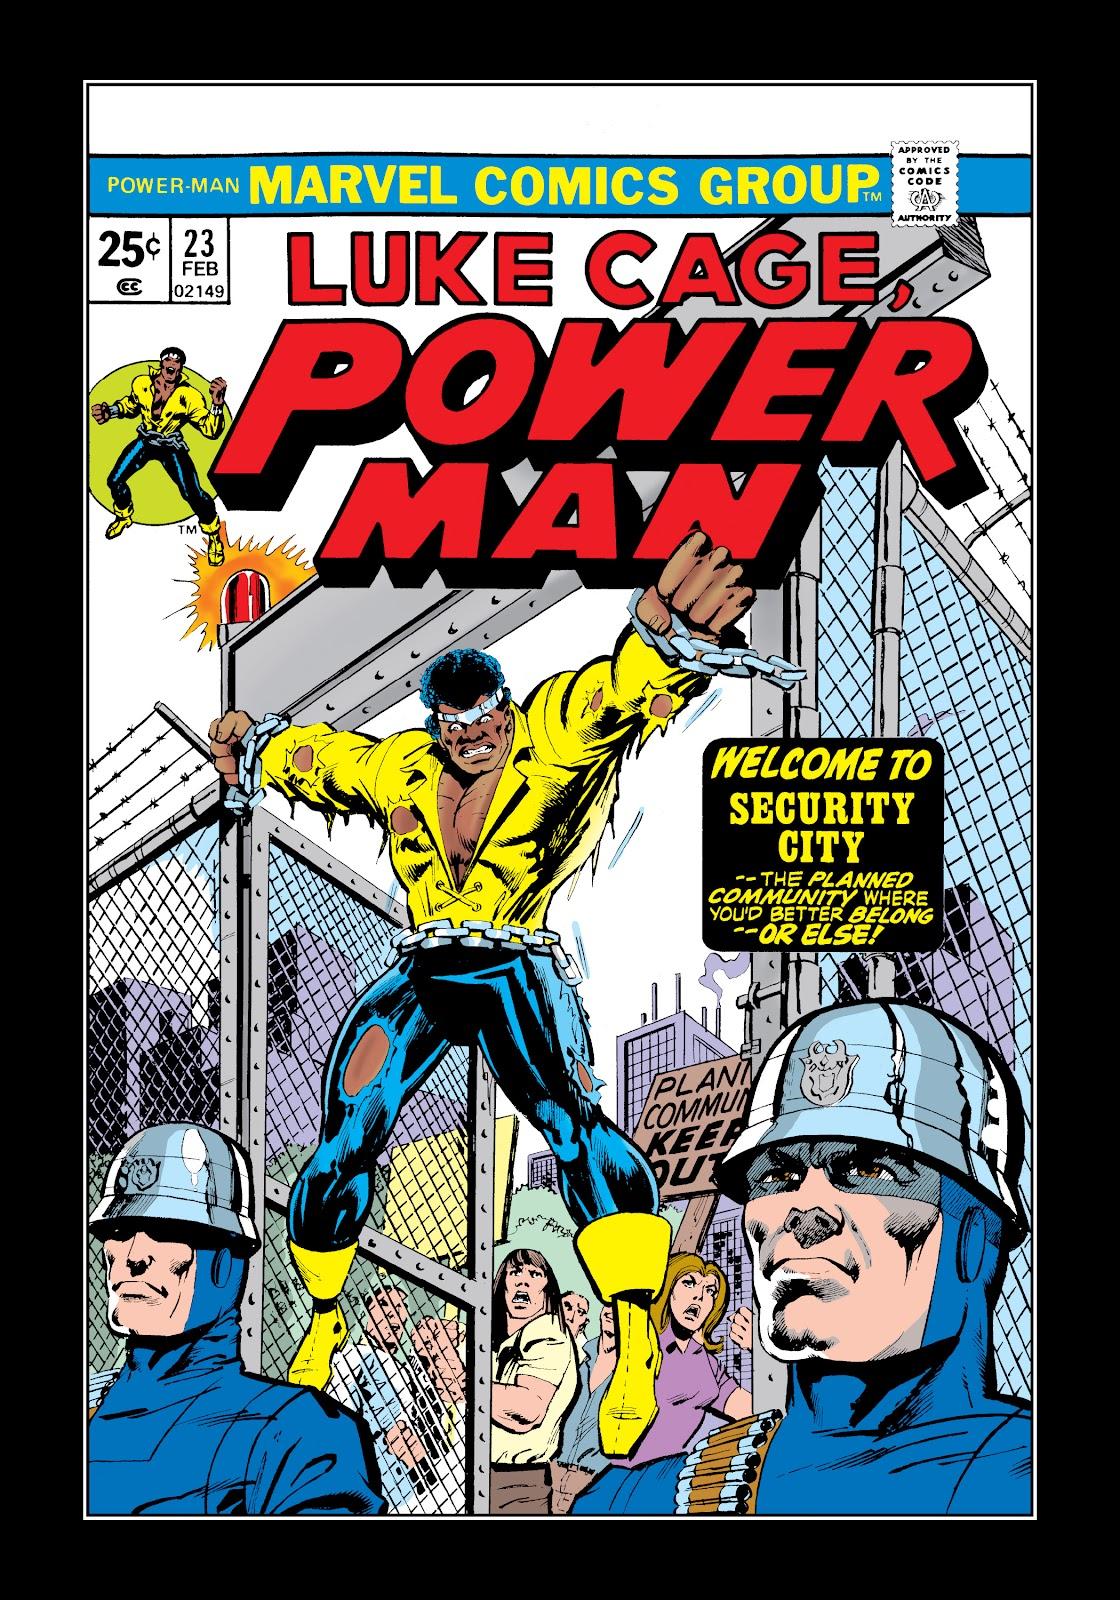 Read online Marvel Masterworks: Luke Cage, Power Man comic -  Issue # TPB 2 (Part 2) - 25